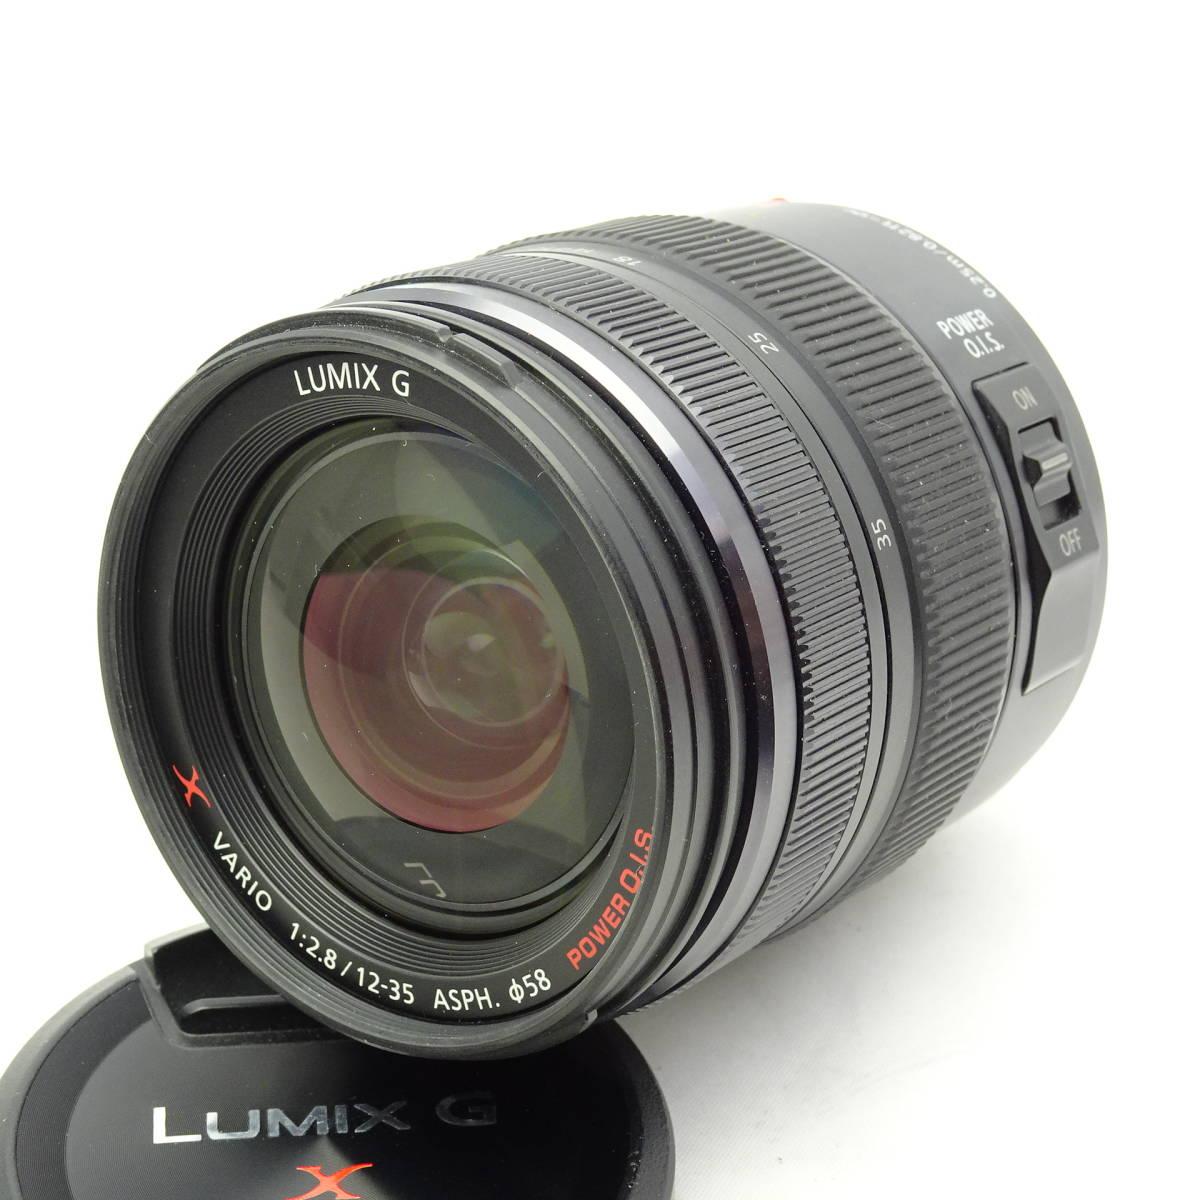 Usedlumix G X Vario 12 35mm H Hs12035 F28 Asph Power Ois Panasonic Lumix F 28 Hs12035e